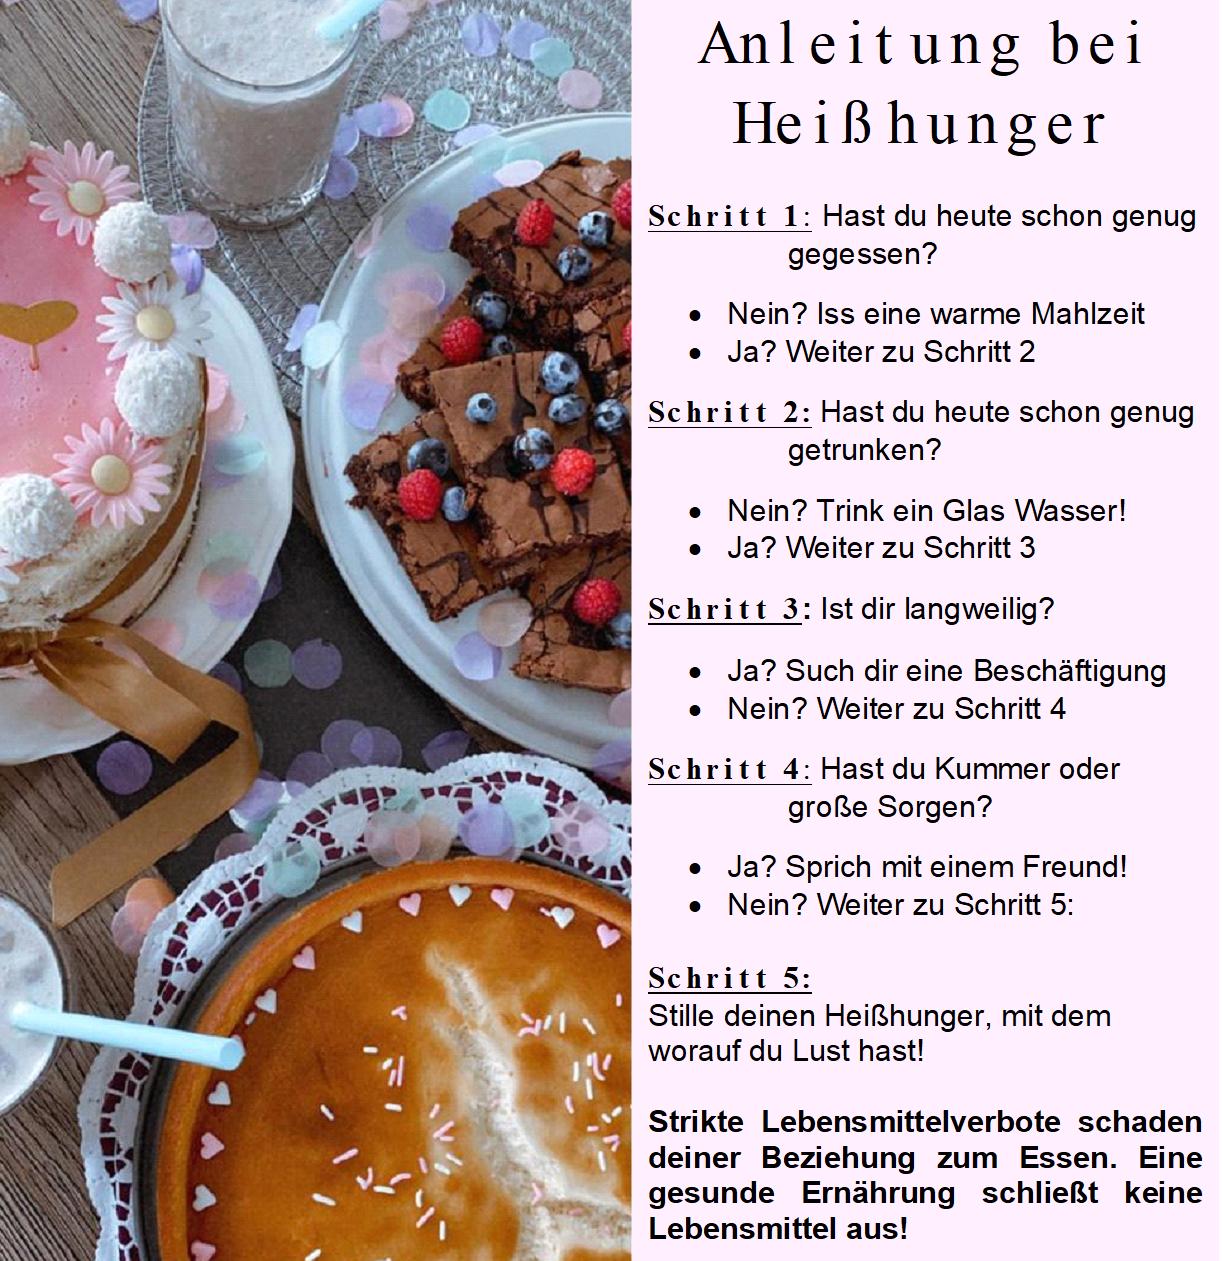 Anleitung bei Heißhunger